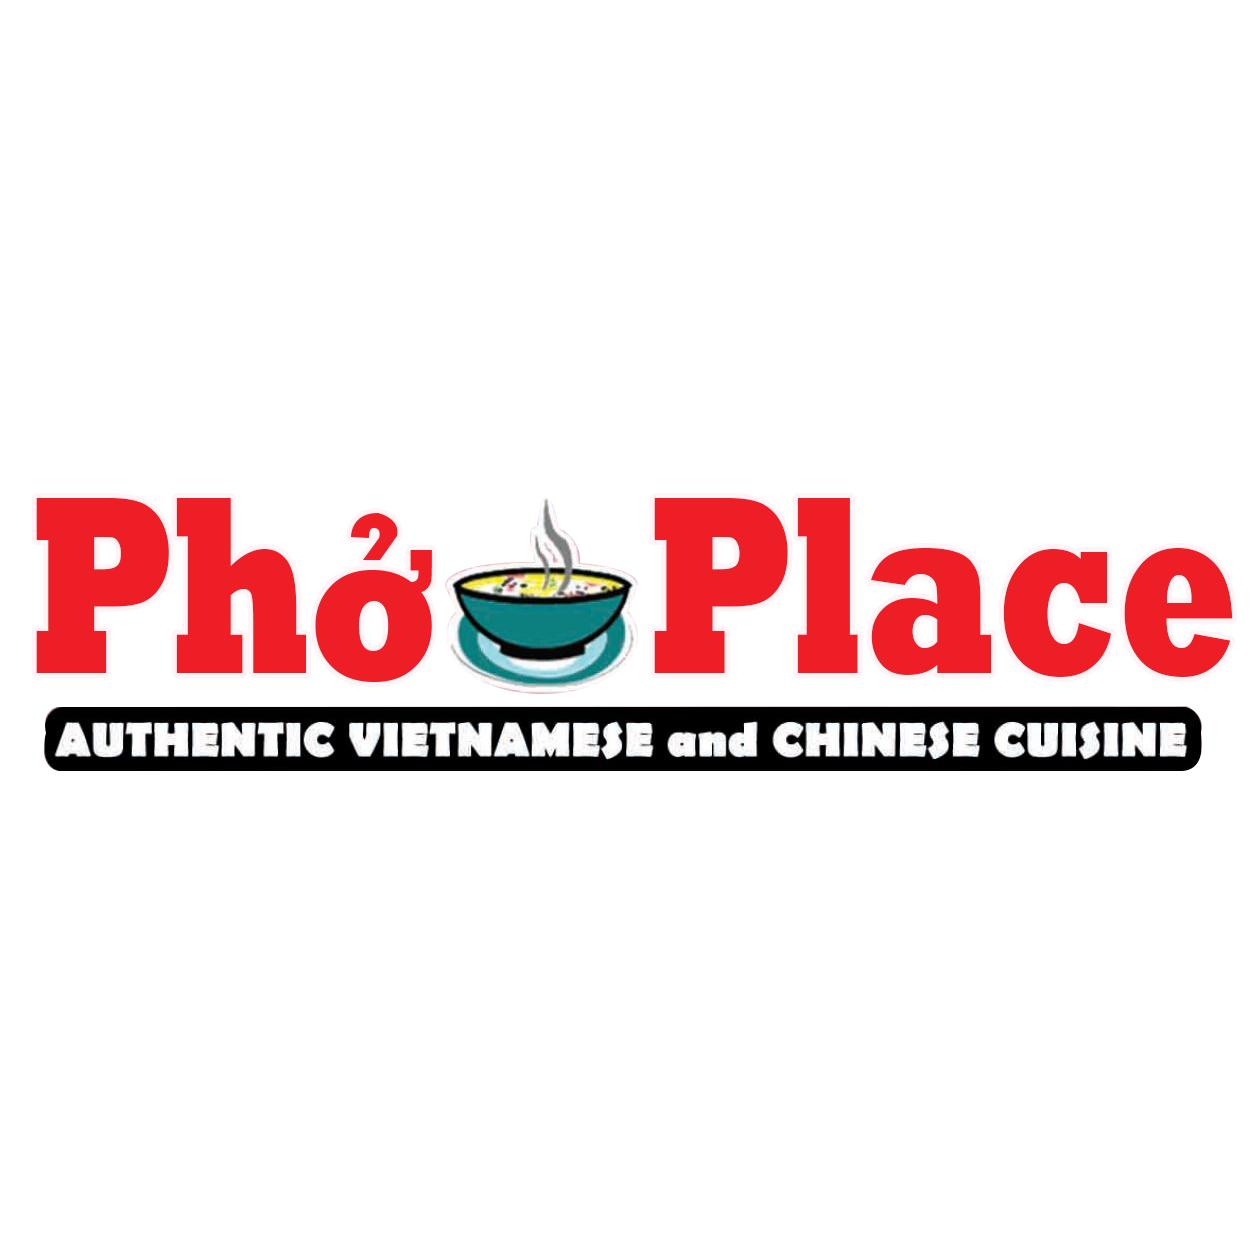 Pho place birmingham alabama for Asian cuisine hoover al